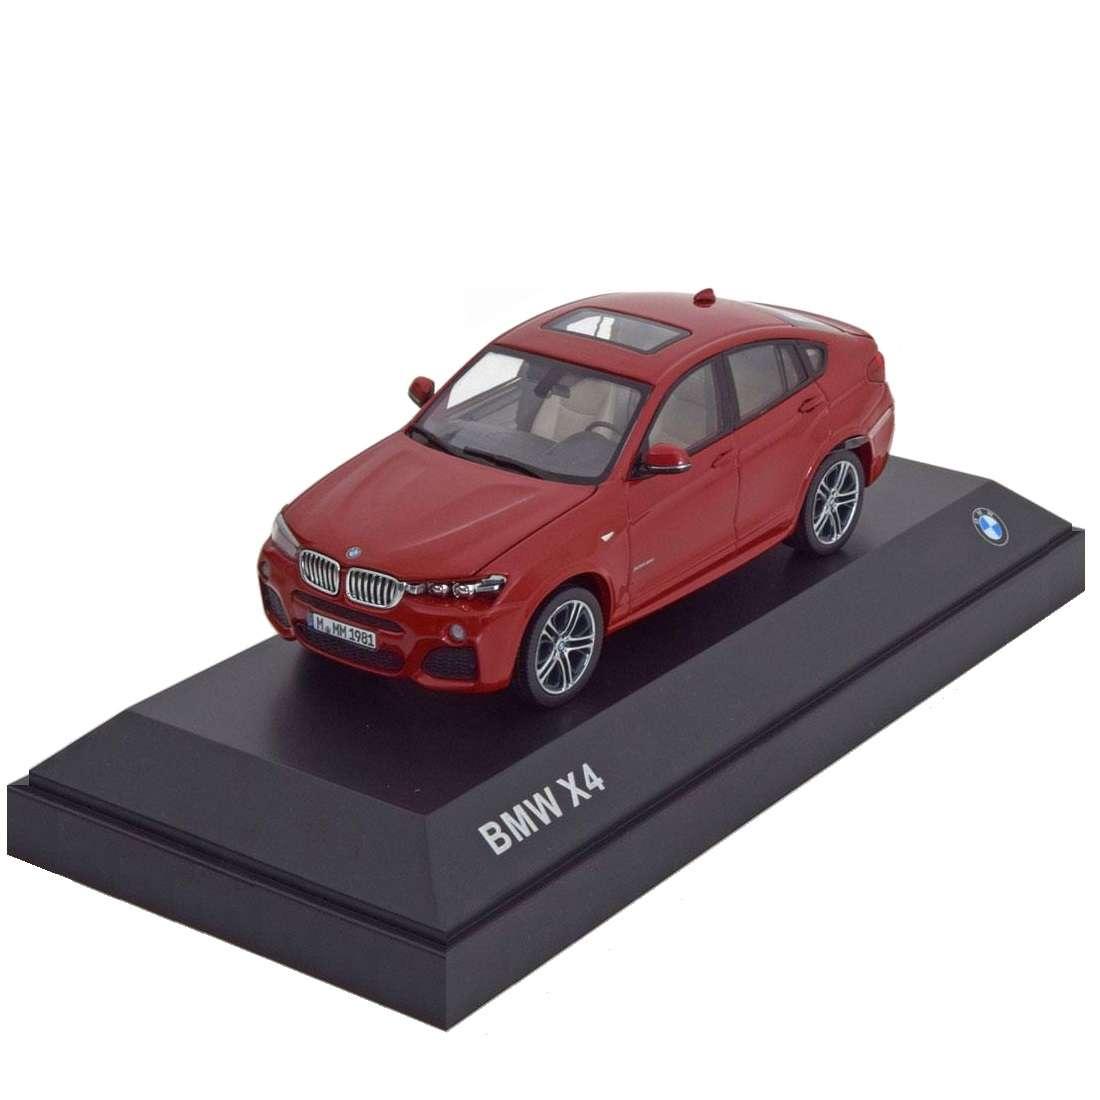 Diecast Car 1/43: Street Cars - BMW X4 (F26), 2014 Photo